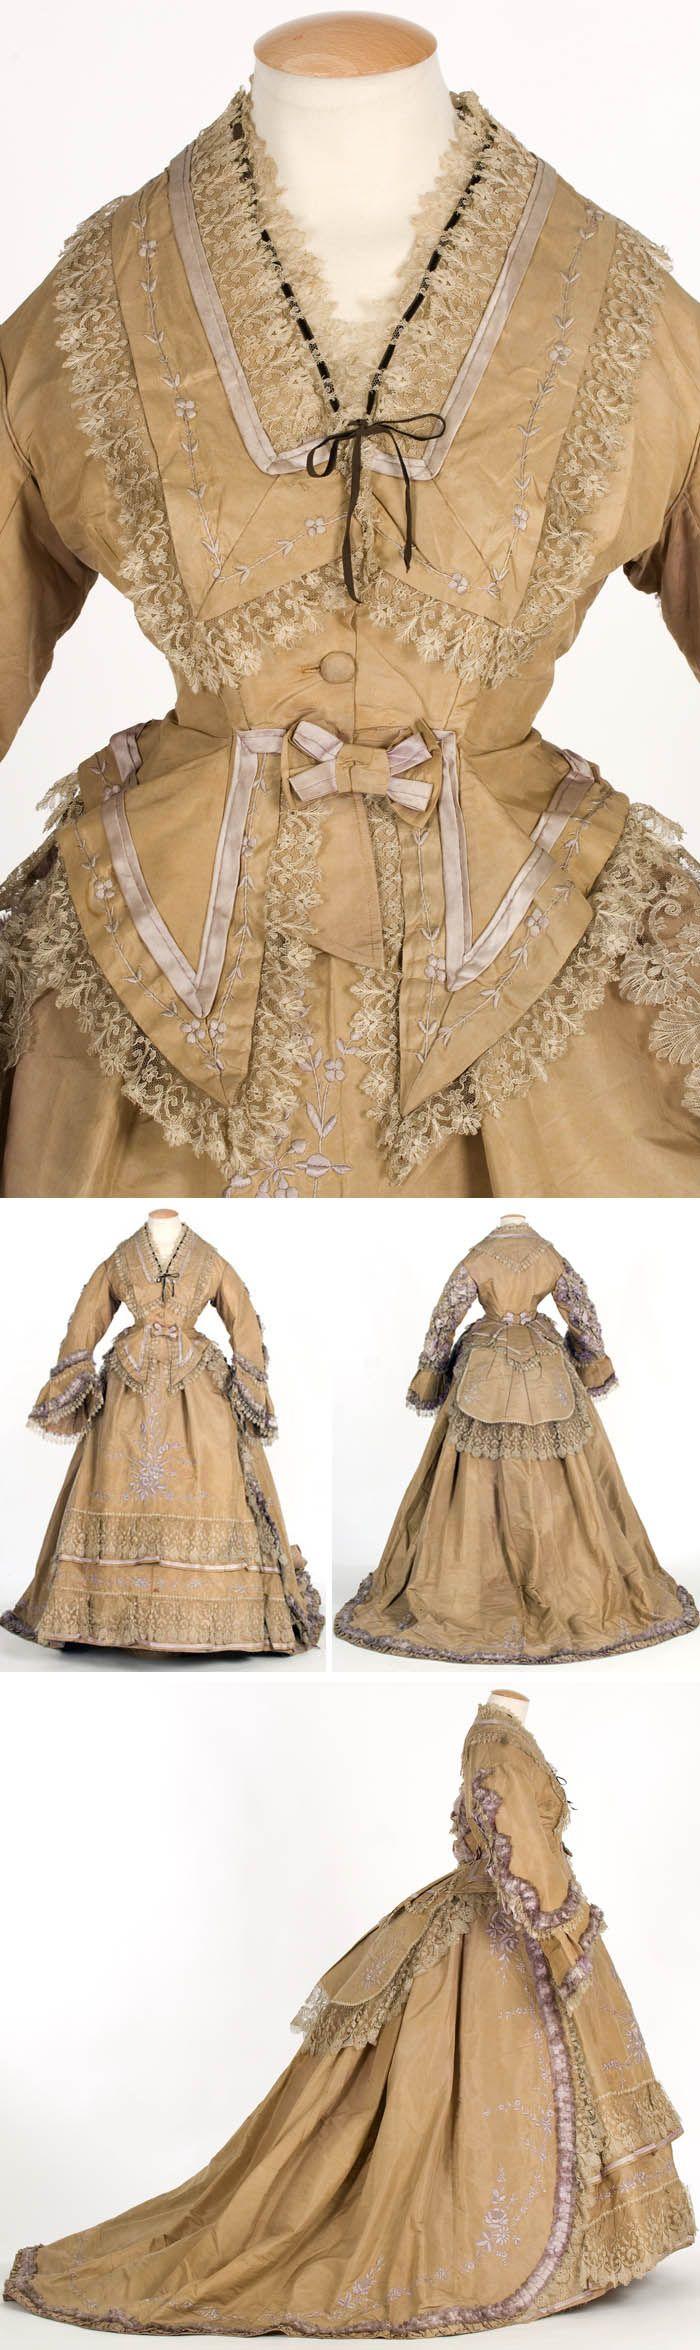 dress style 485 documentation